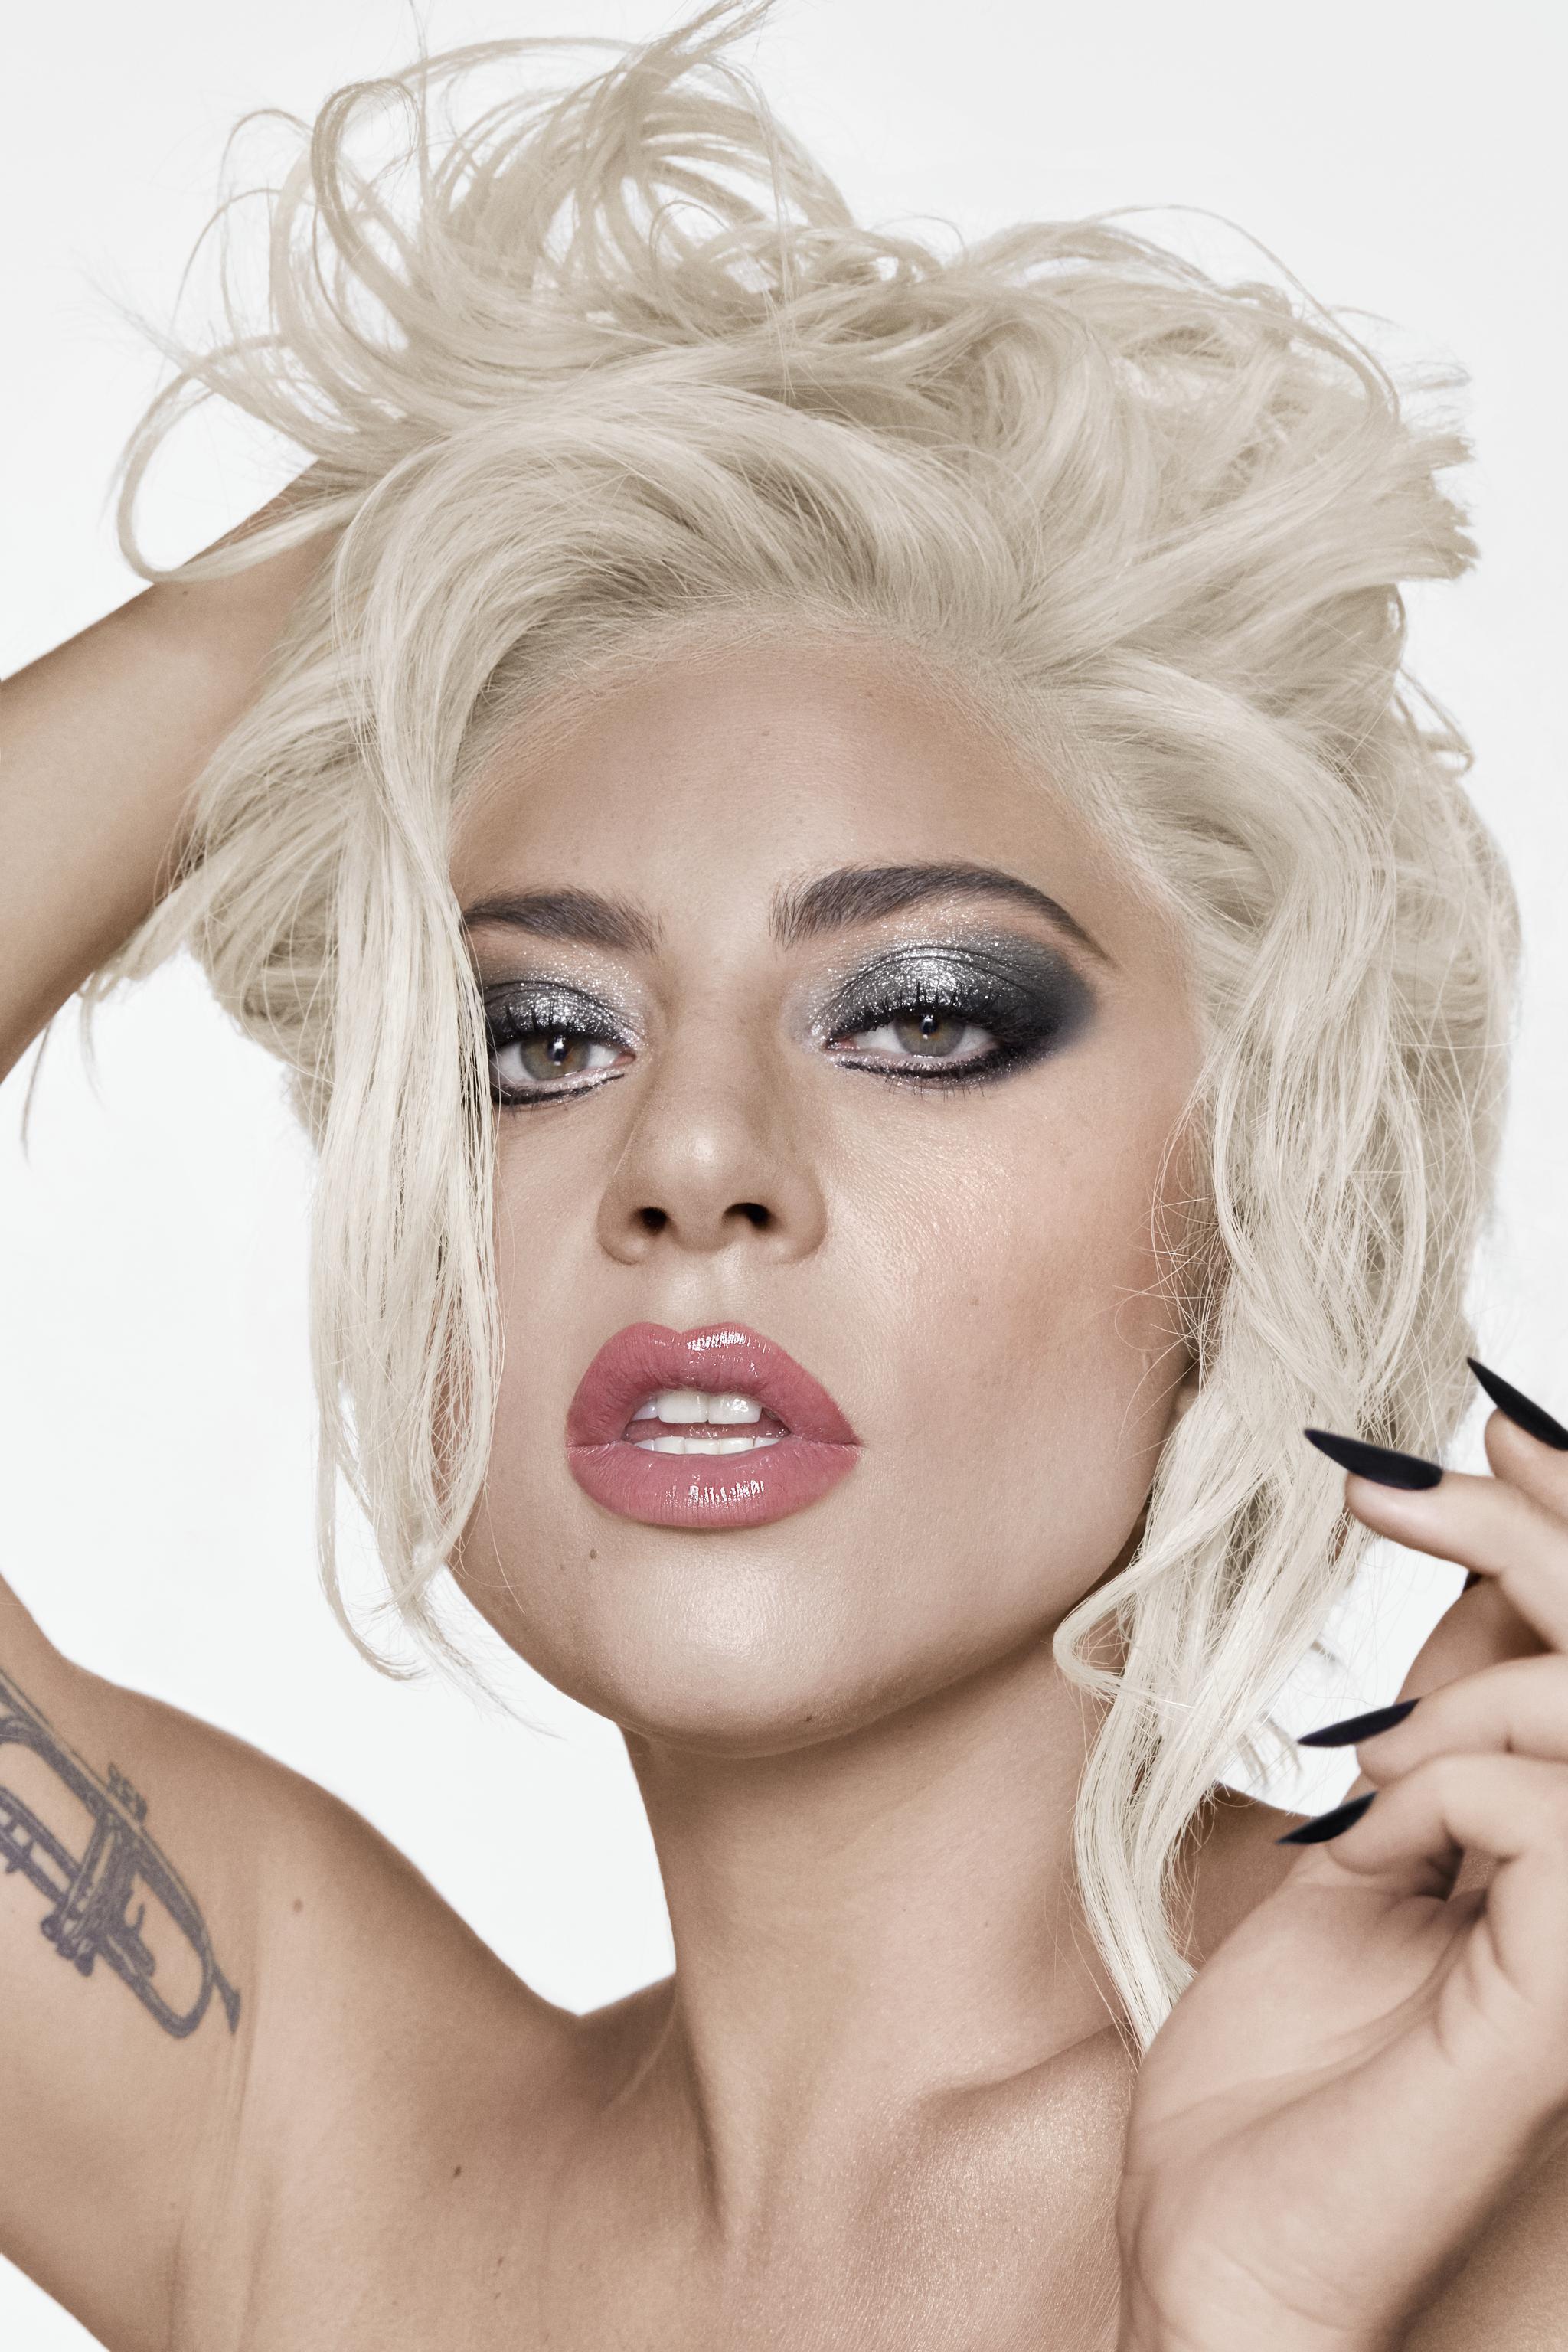 Lady-Gaga-Metalhead-Makeup-Tutorial-Wear